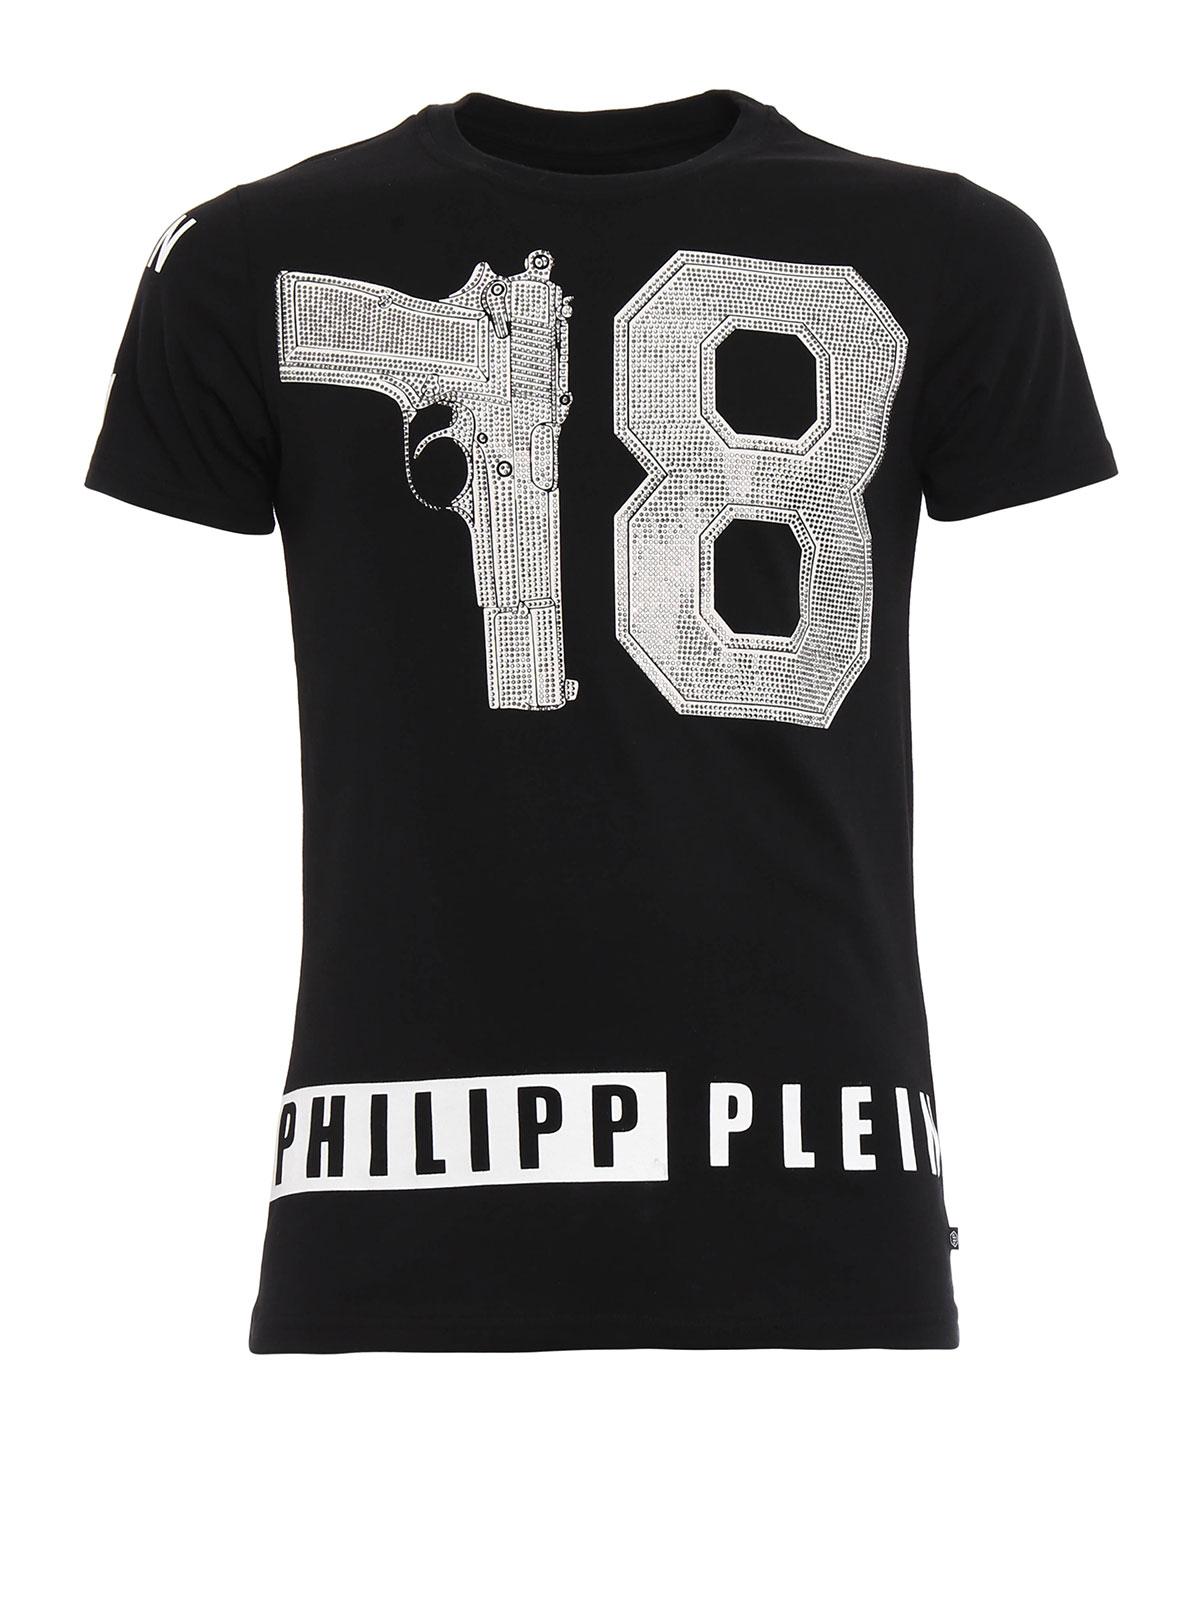 philipp plein t shirt hotel t shirt hm342541 02. Black Bedroom Furniture Sets. Home Design Ideas